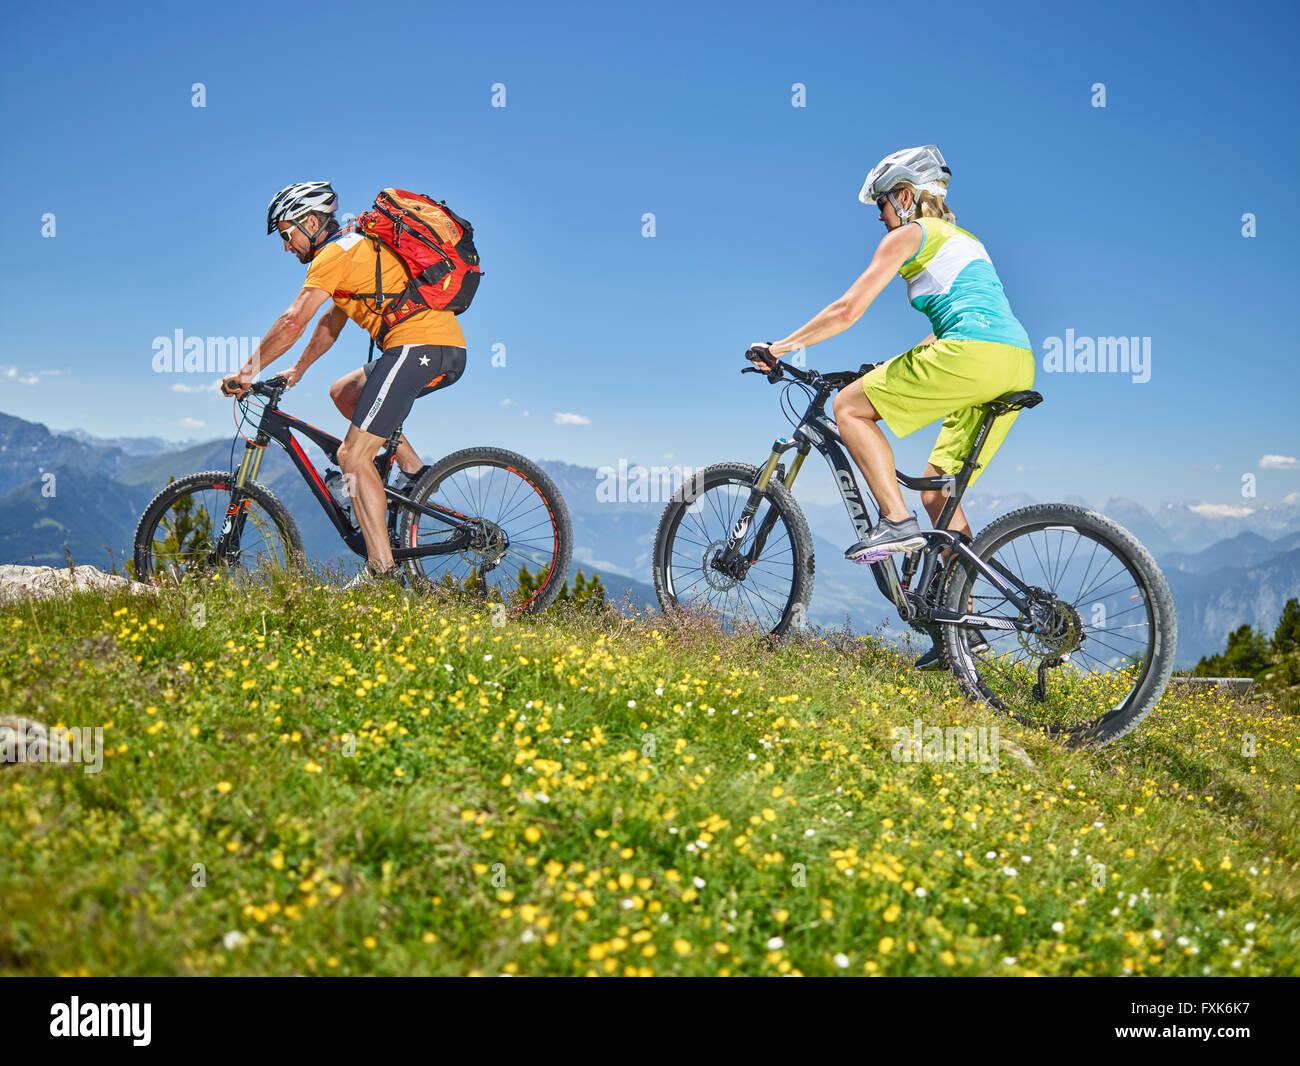 Man 40-45 years and woman 35-40 years with helmets cycle with their mountain bikes, Zirbenweg, Patscherkofel, Innsbruck, Stock Photo